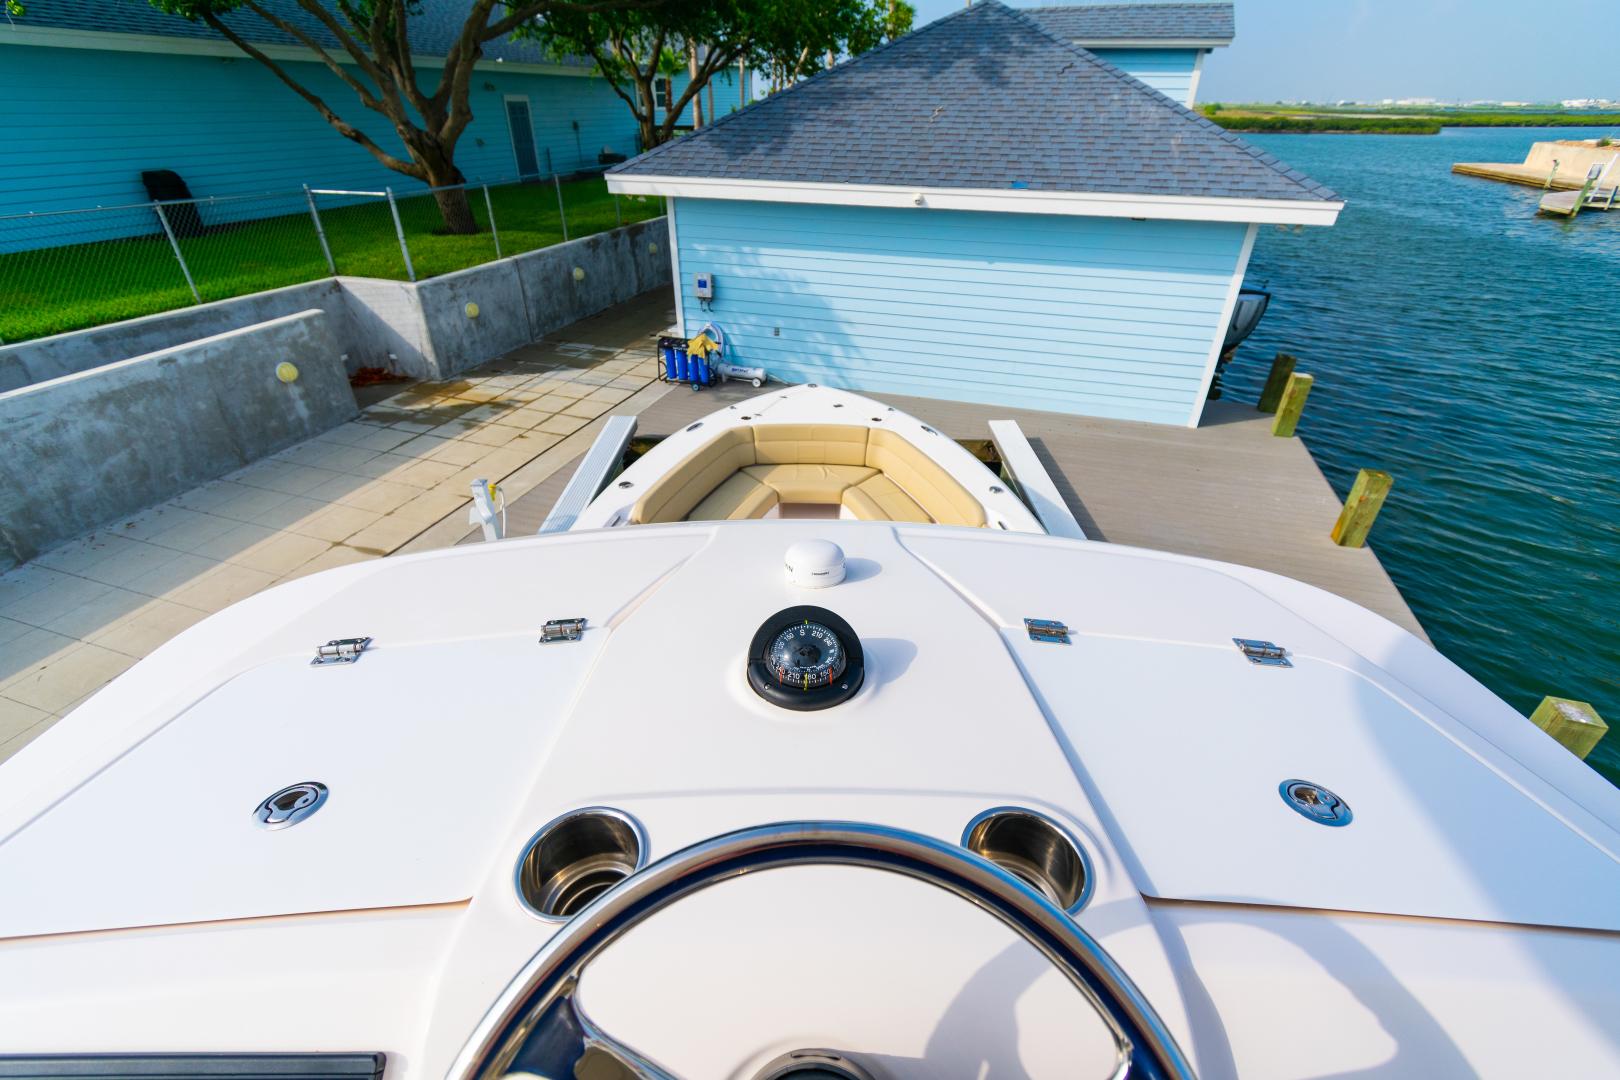 Pursuit-408 Sport 2019-Mattie Rose Port Aransas-Texas-United States-Pursuit 408 Sport 2019 Mattie Rose-1437258 | Thumbnail